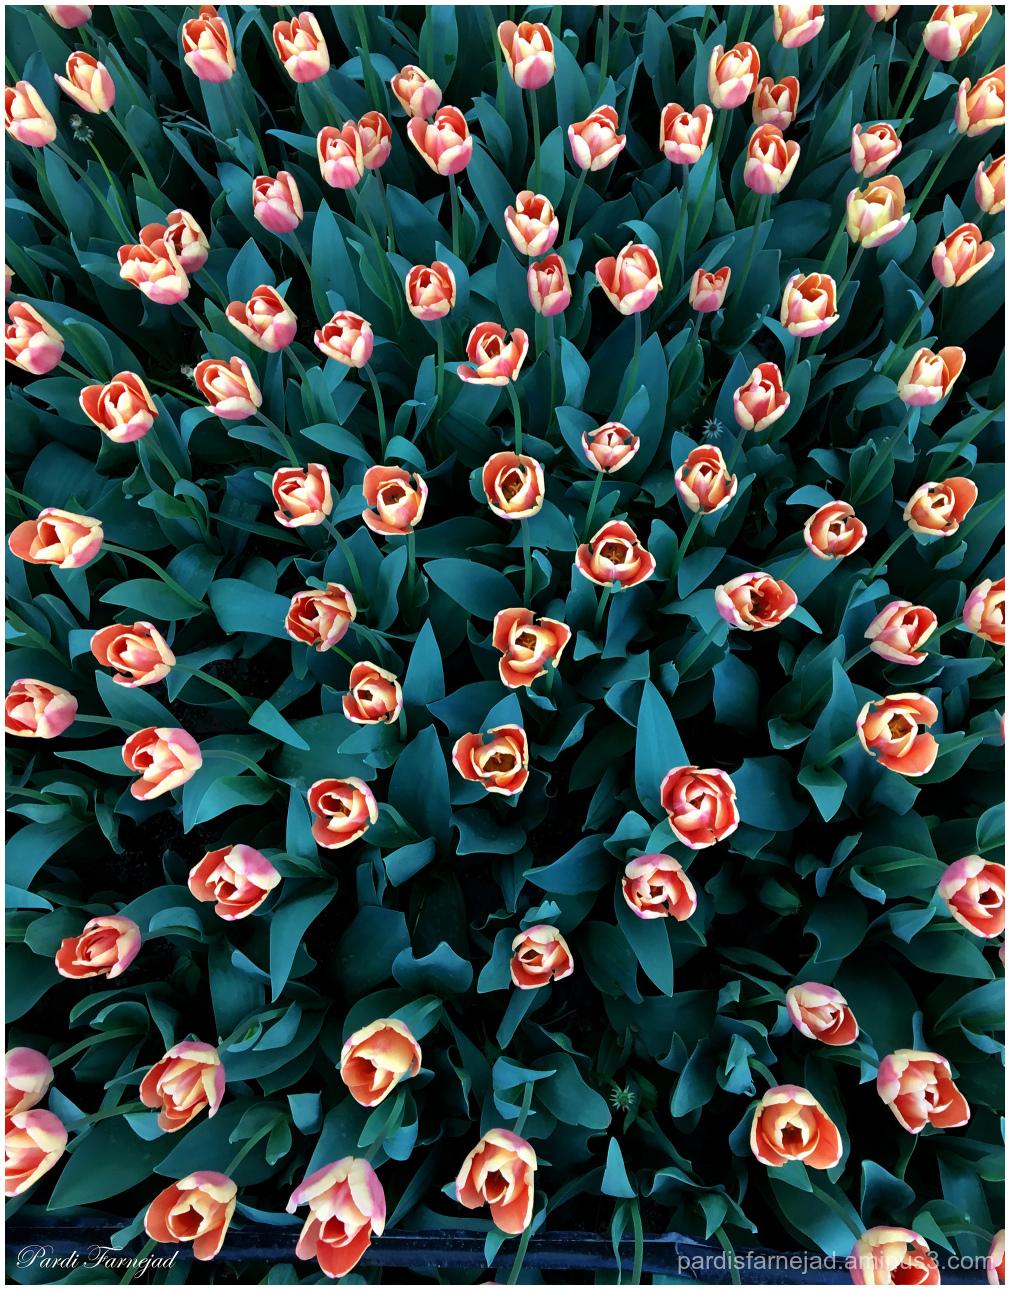 In Love of Tulips